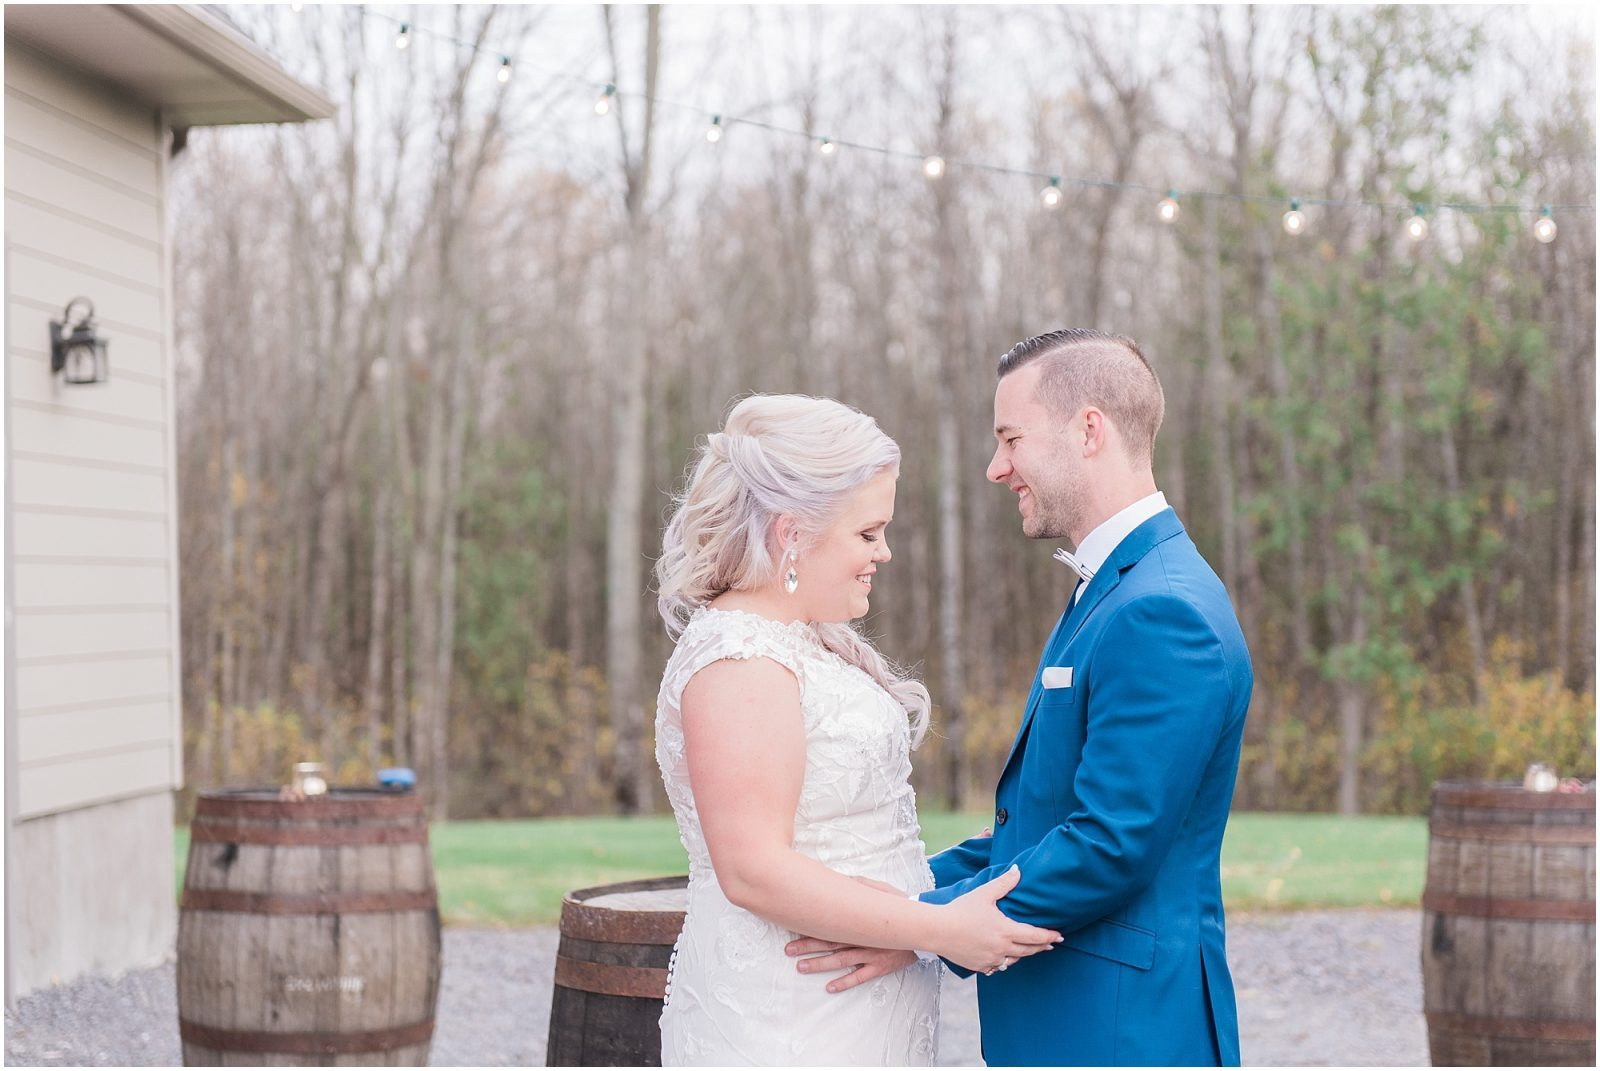 0038 Bethany and Luc - Fall Backyard Ottawa Wedding - Copper and Navy - PhotosbyEmmaH.jpg